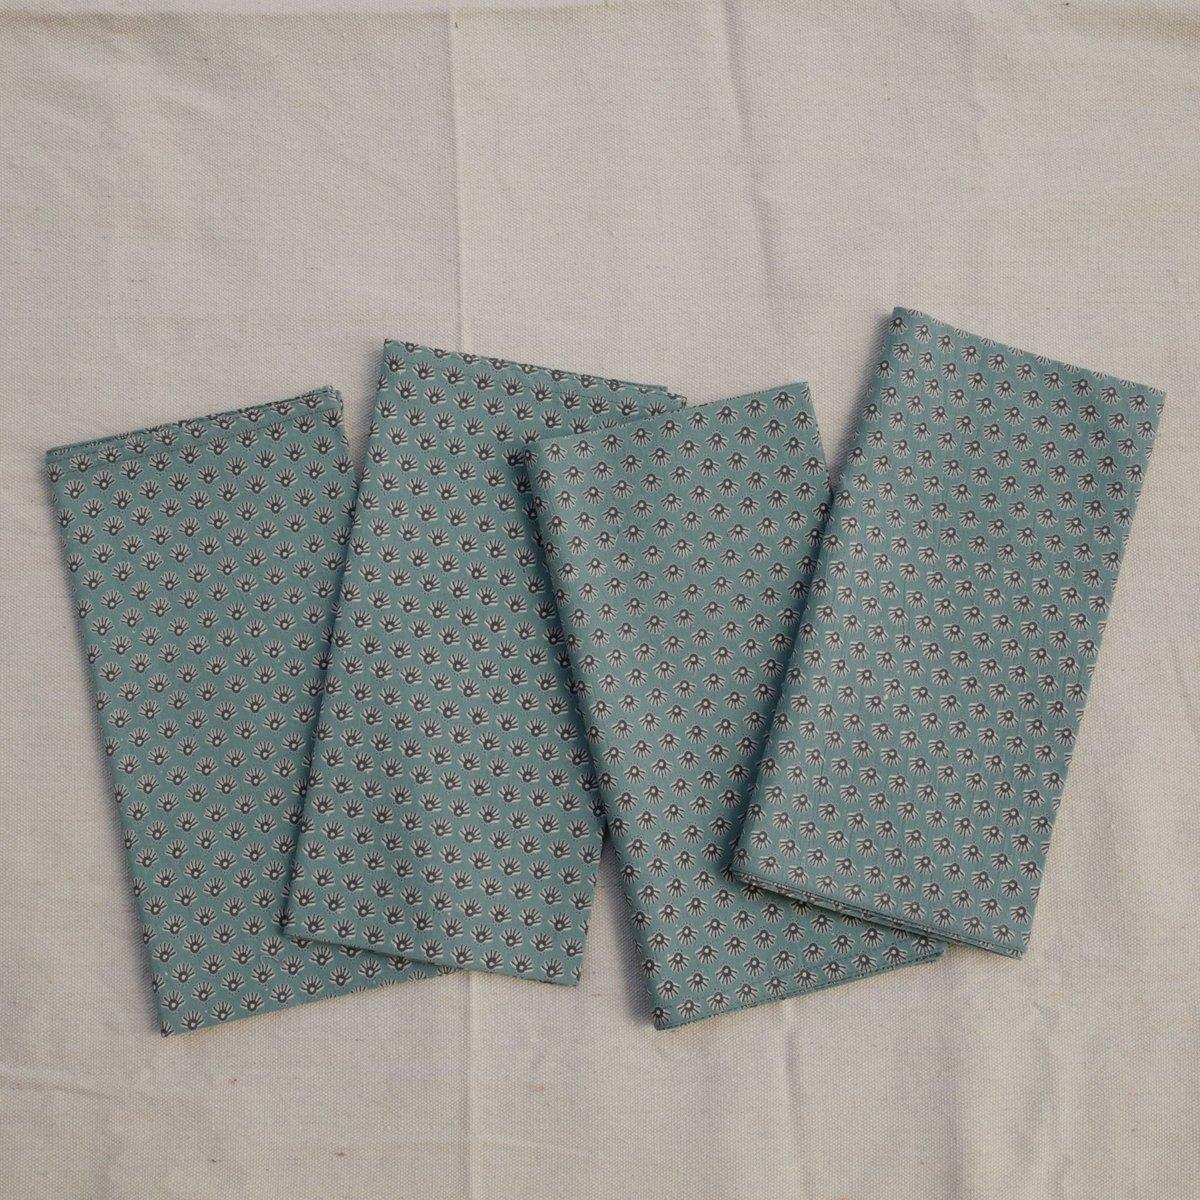 Image of Celeste Seafoam Block Printed Napkins Set/4